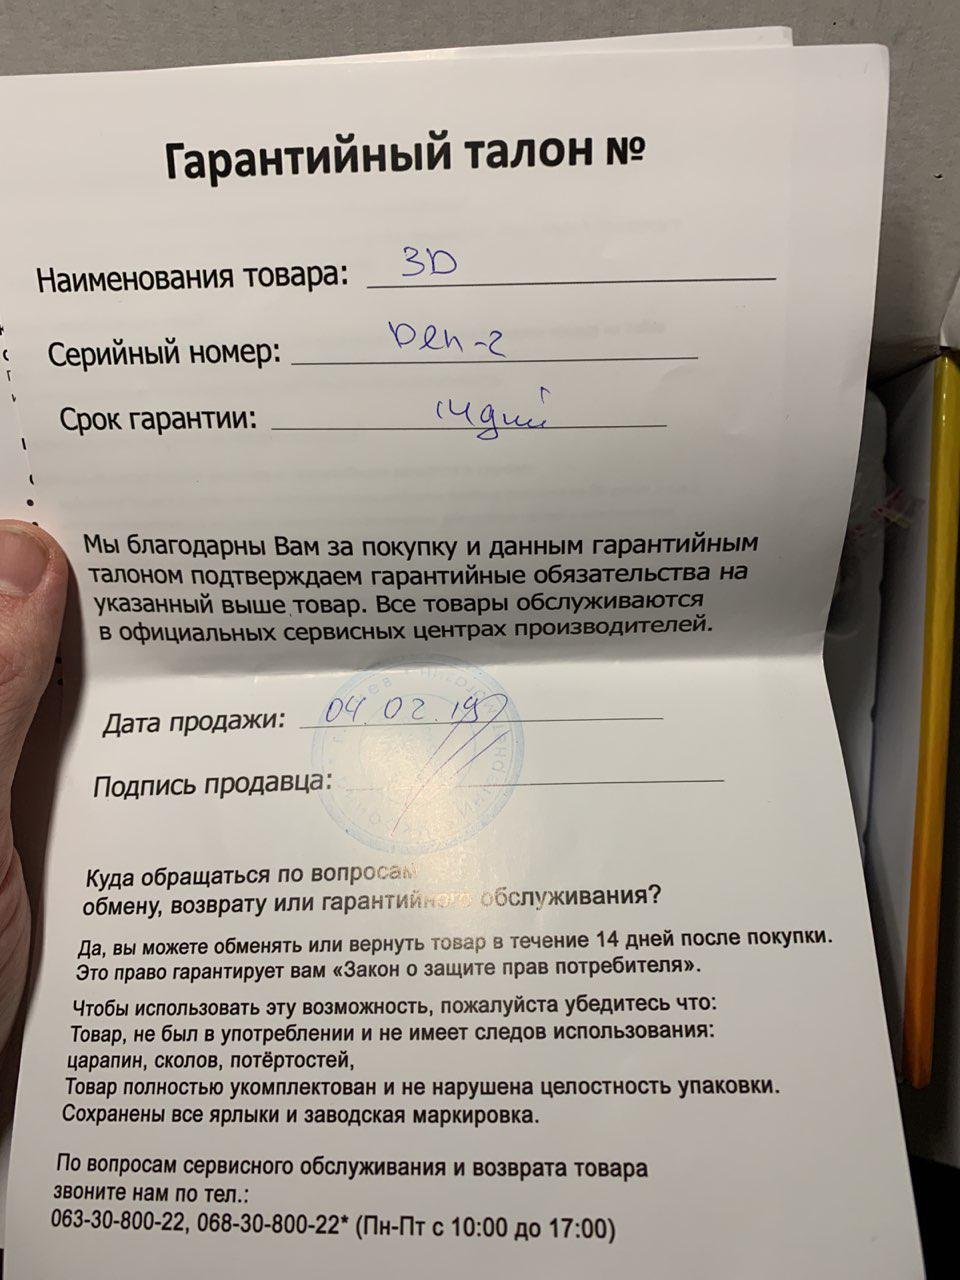 3dpens.com.ua интернет-магазин - Товар хлам. Мусор.